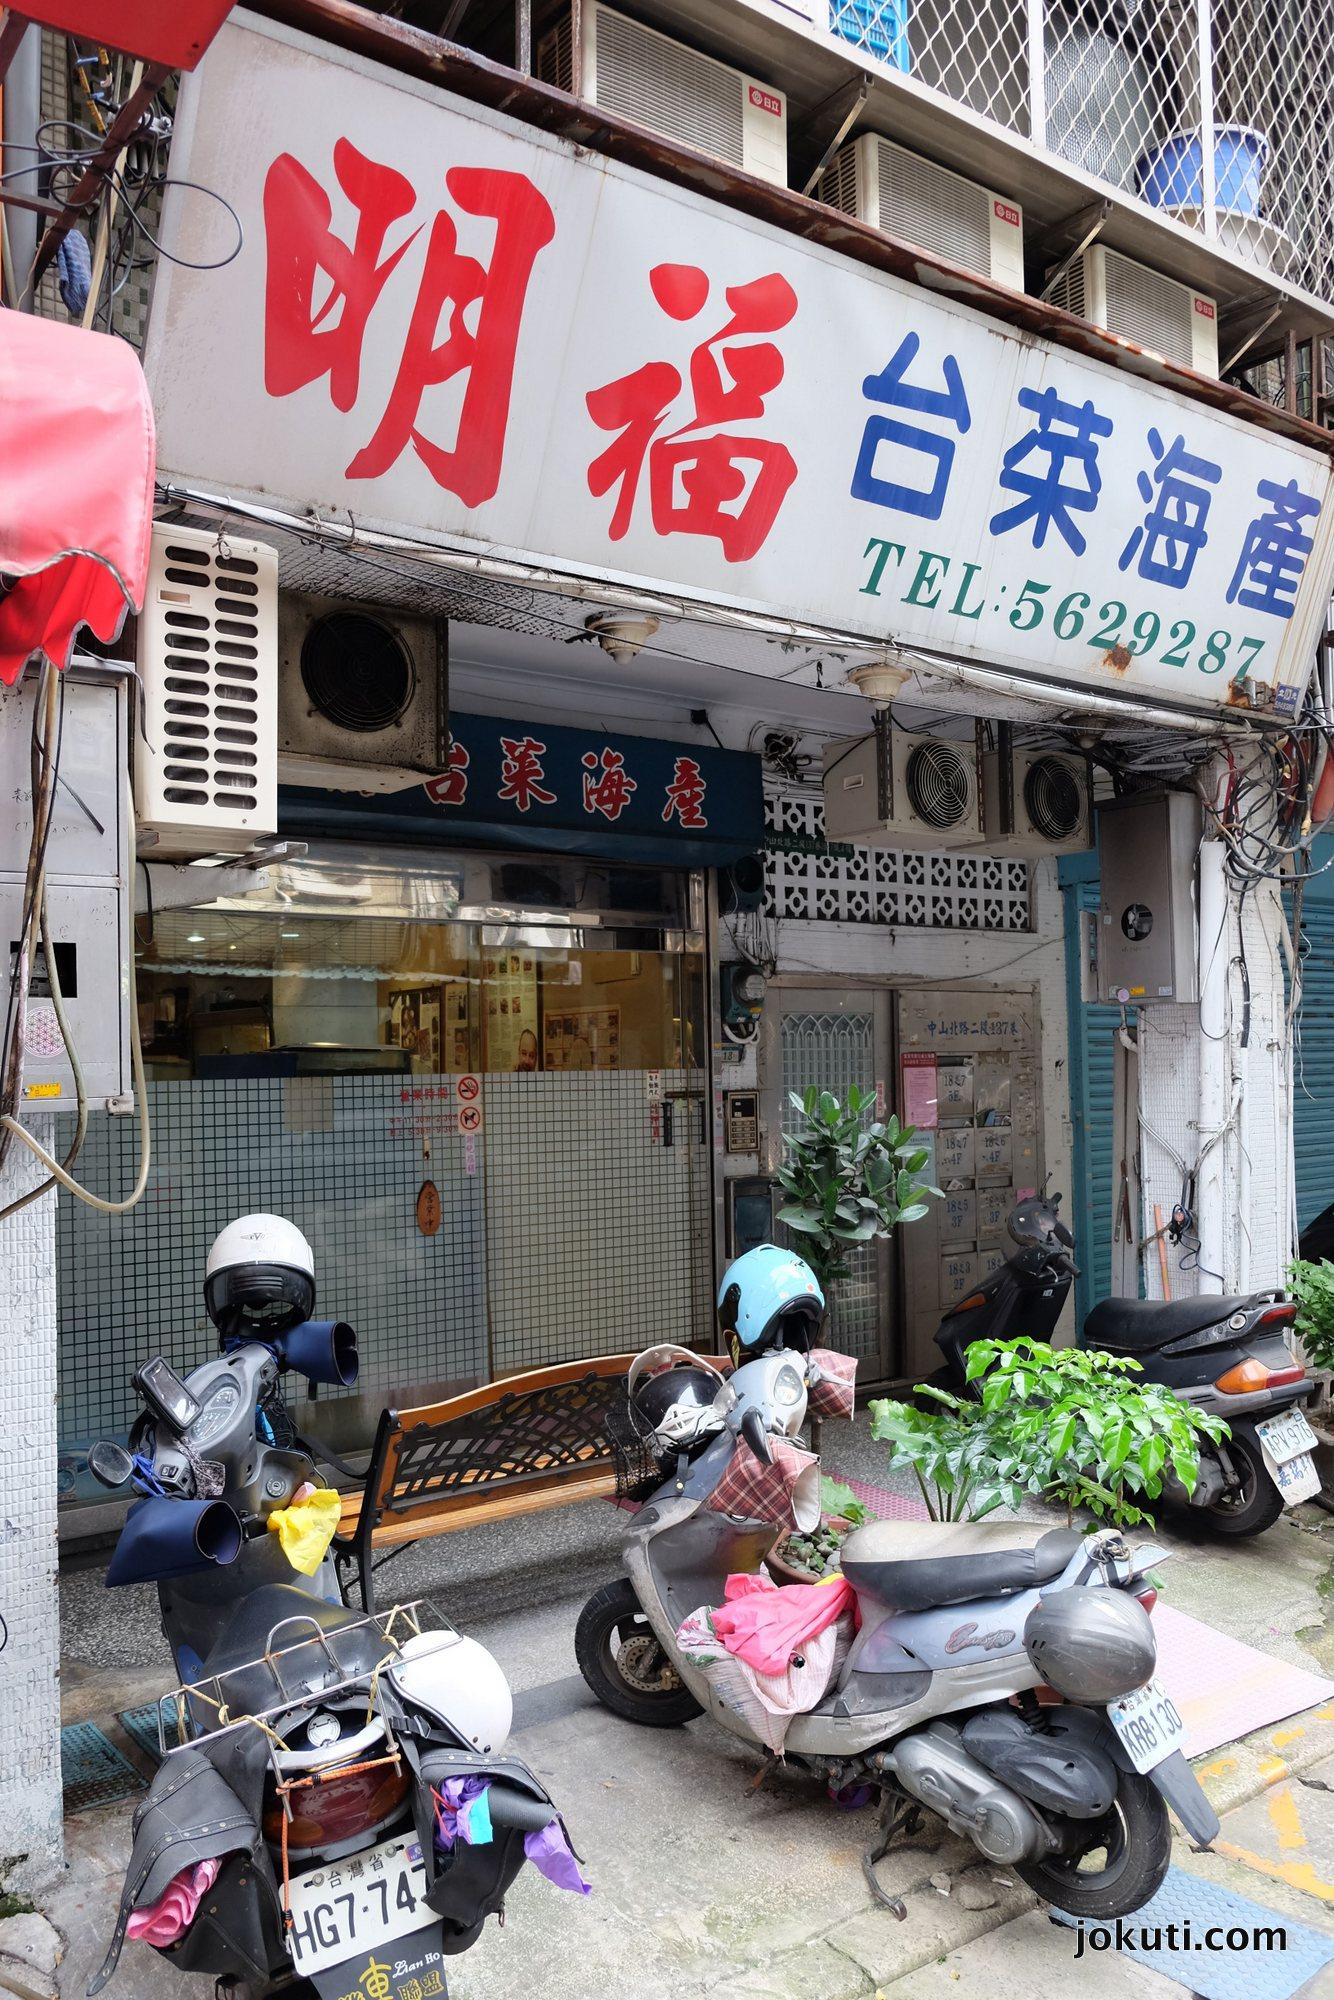 dscf3023_taipei_ming_fu_seafood_michelin_taiwan_vilagevo_jokuti.jpg